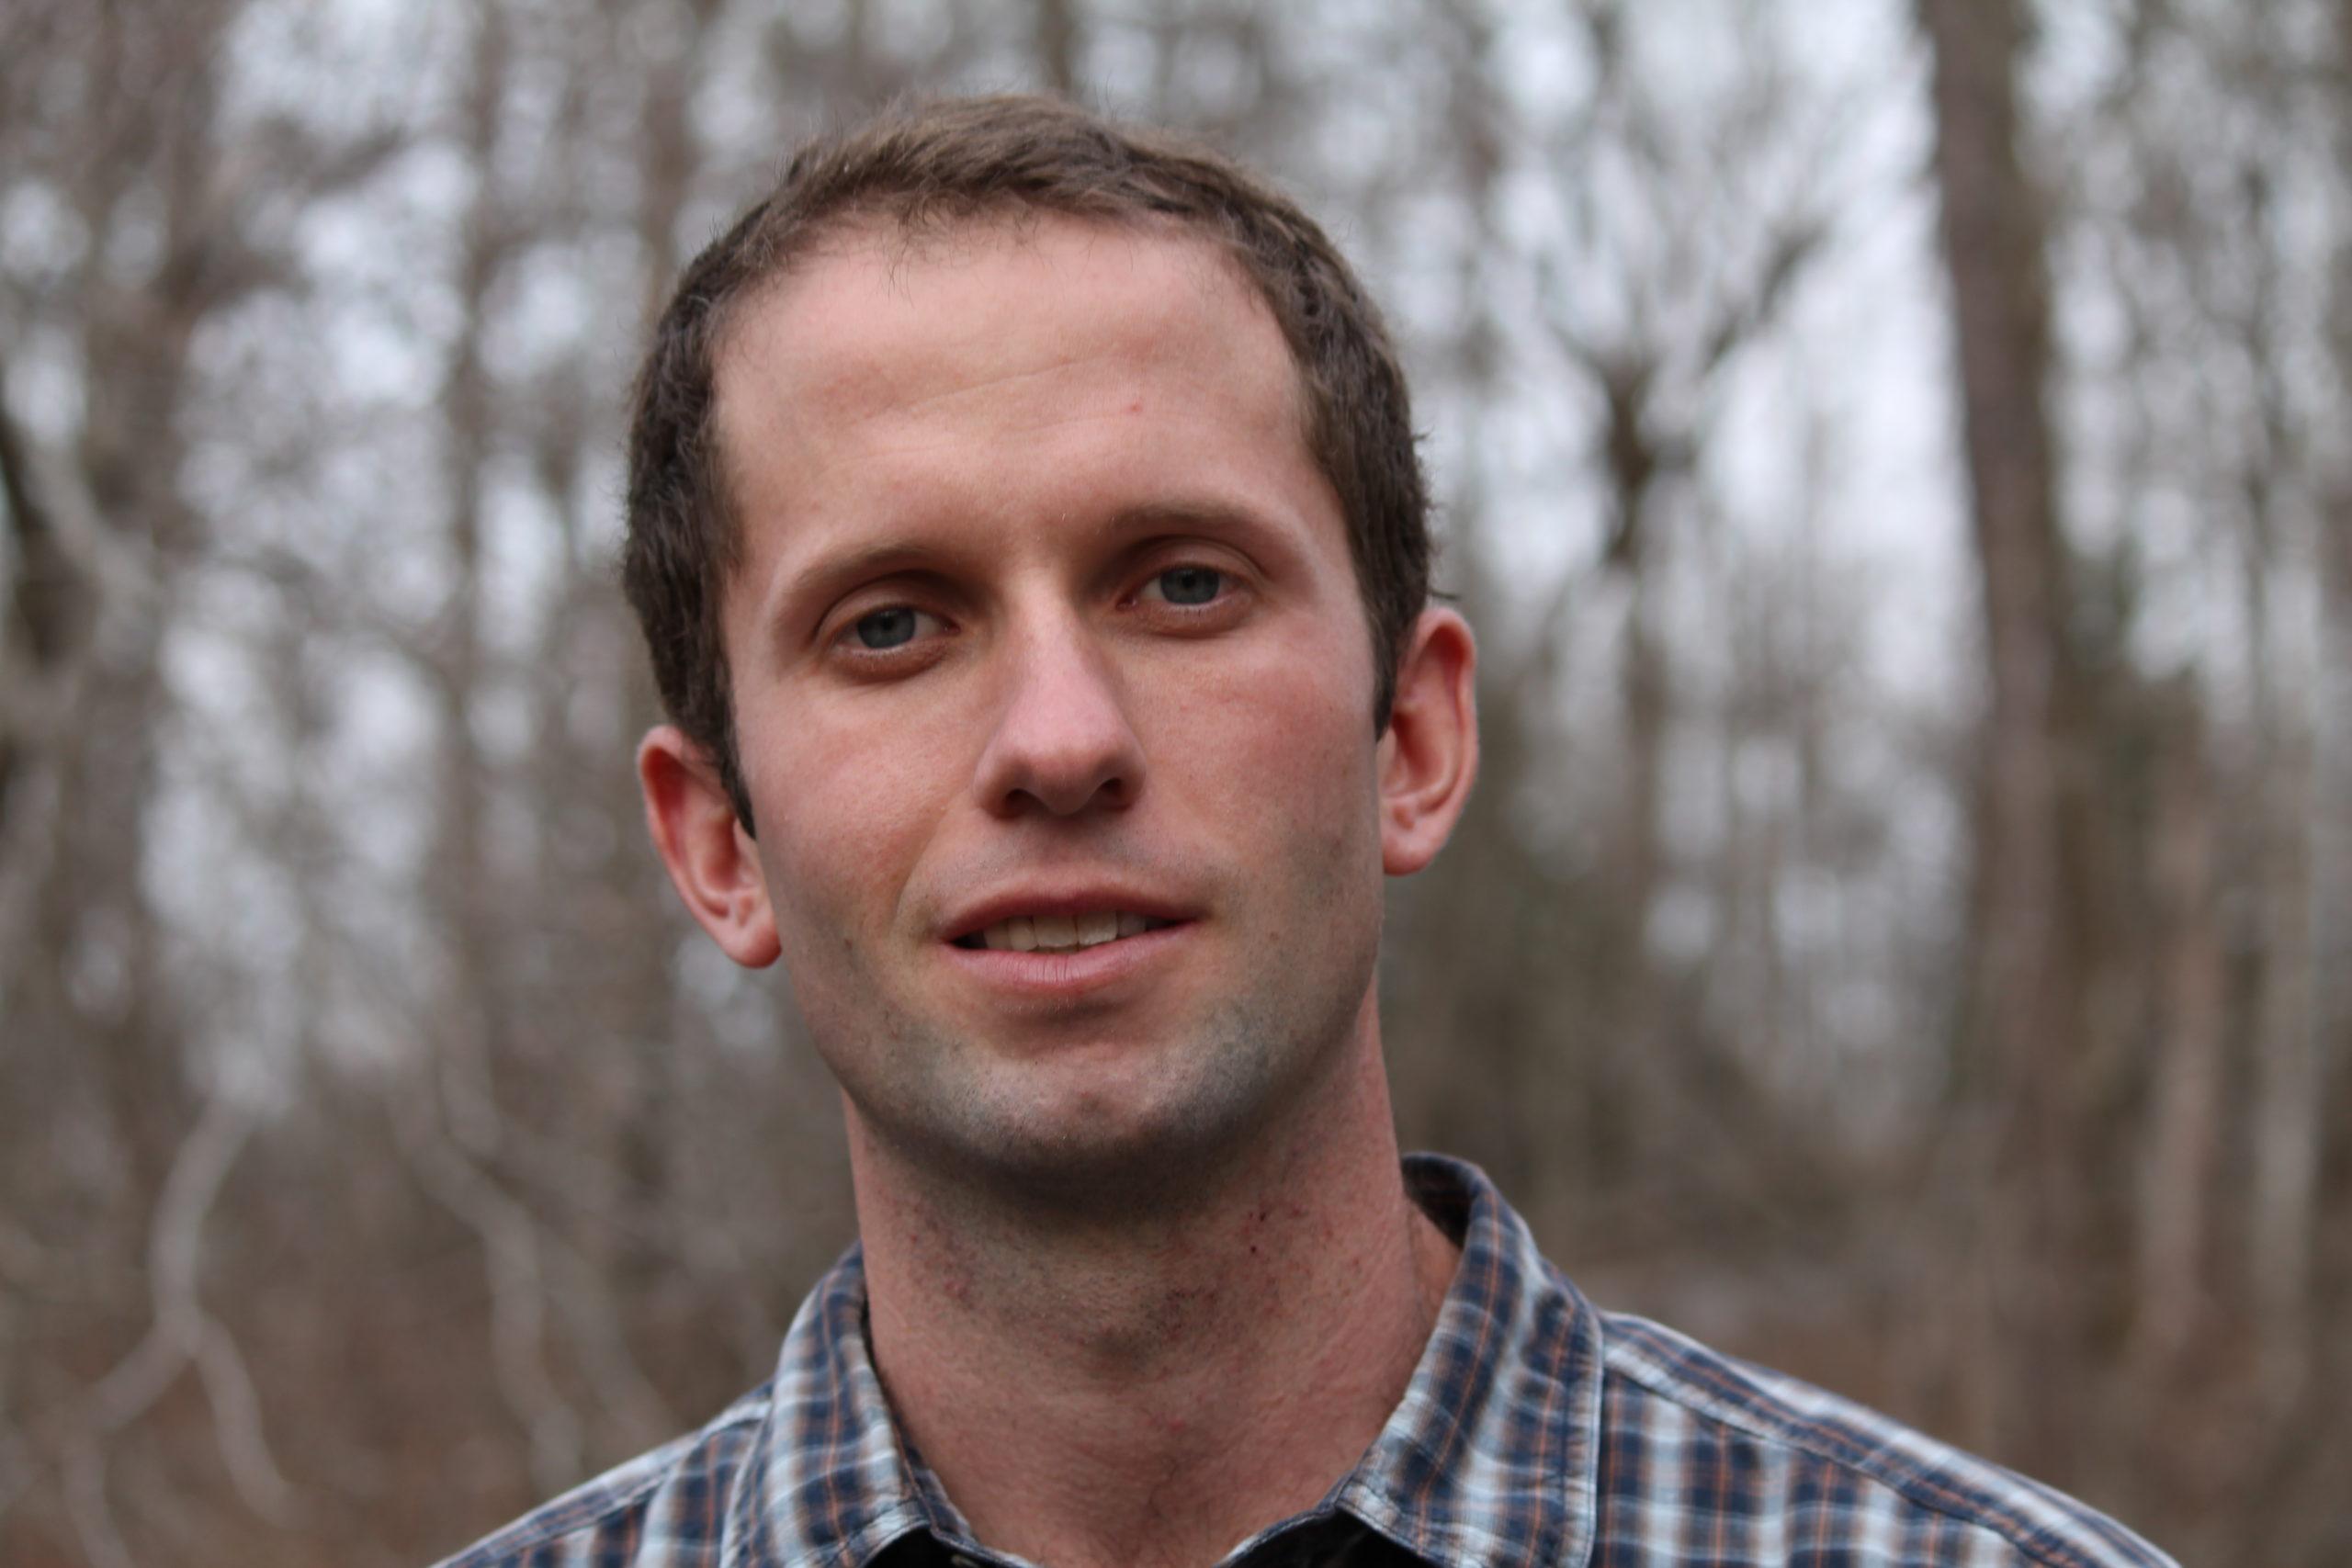 Mountain BizWorks business coach, Barry Gupton